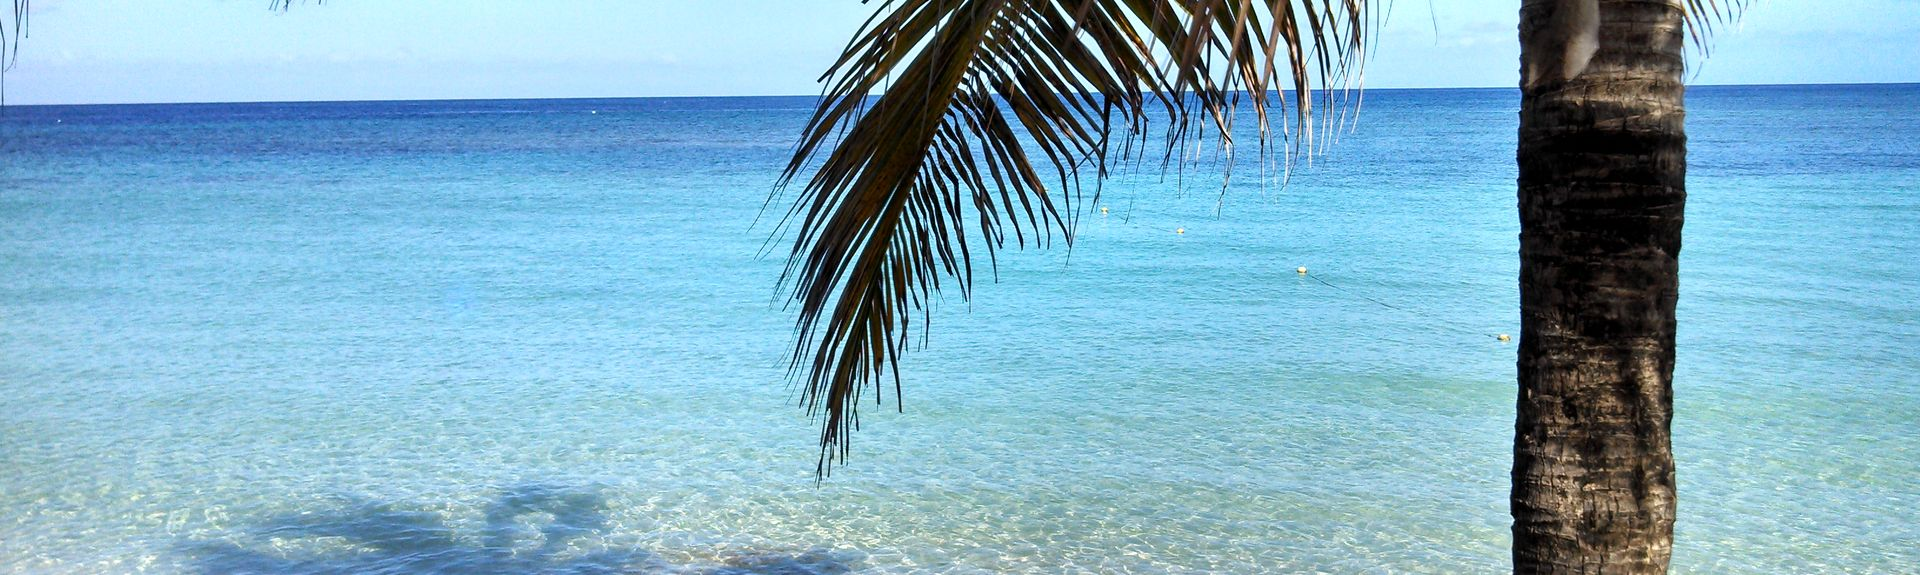 Infinity Bay (West Bay, Bay Islands, Honduras)